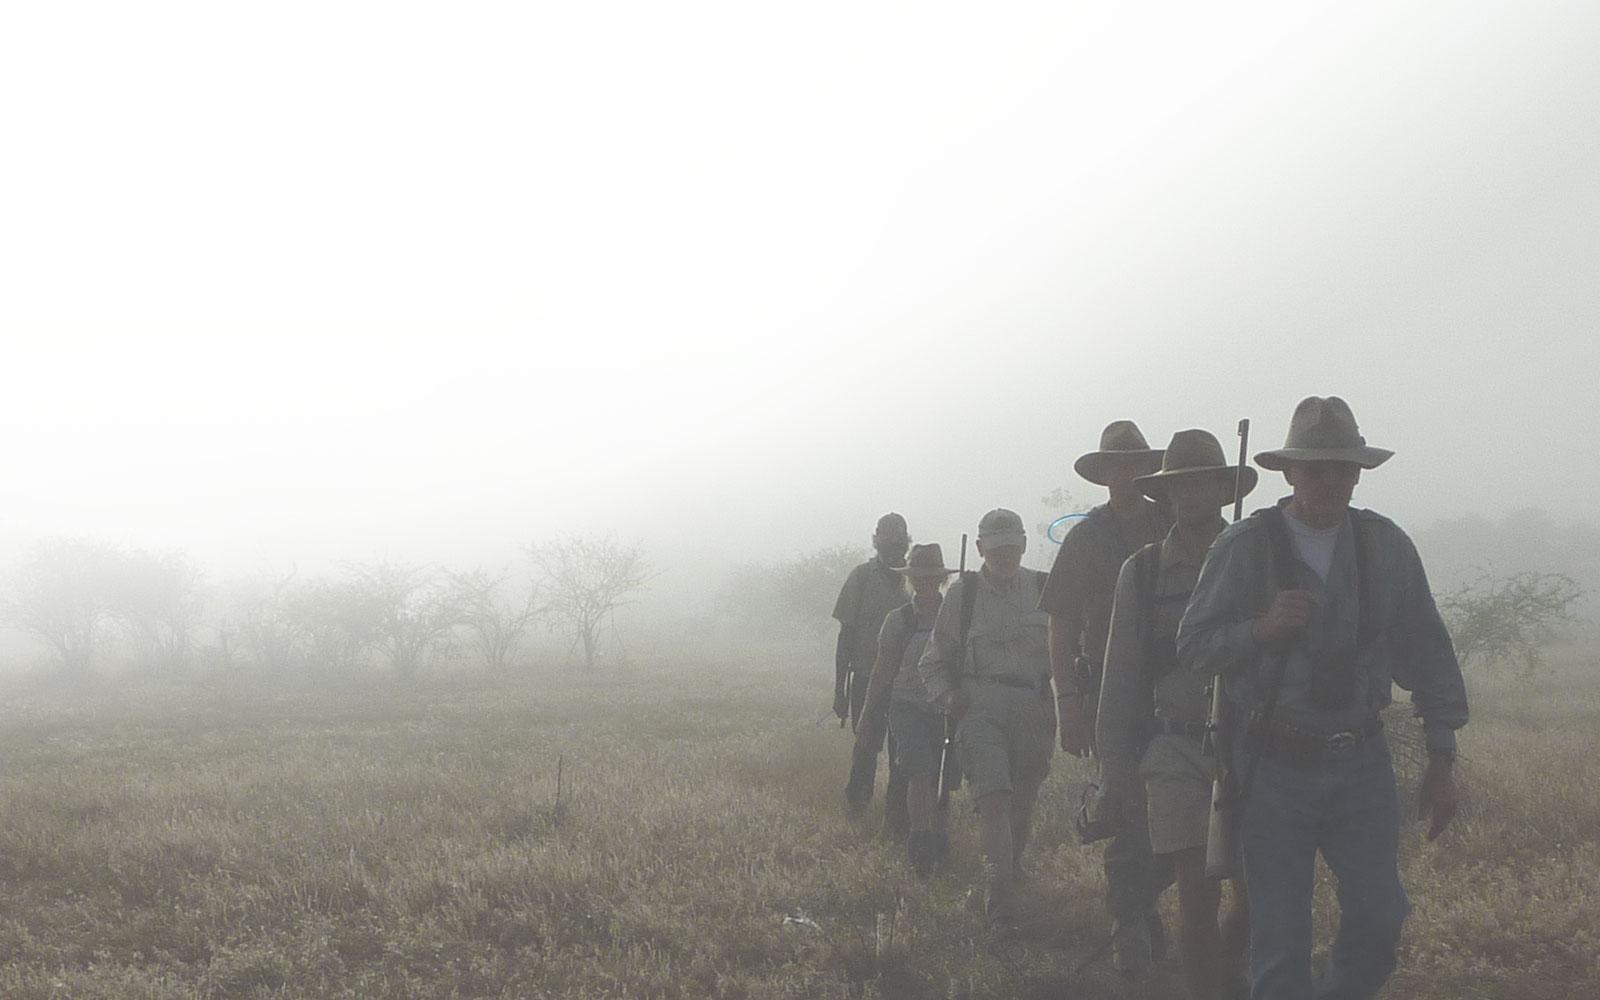 Entfernungsmesser Jagd Test 2014 : Unsere partner jagdreisen k&k premium jagd